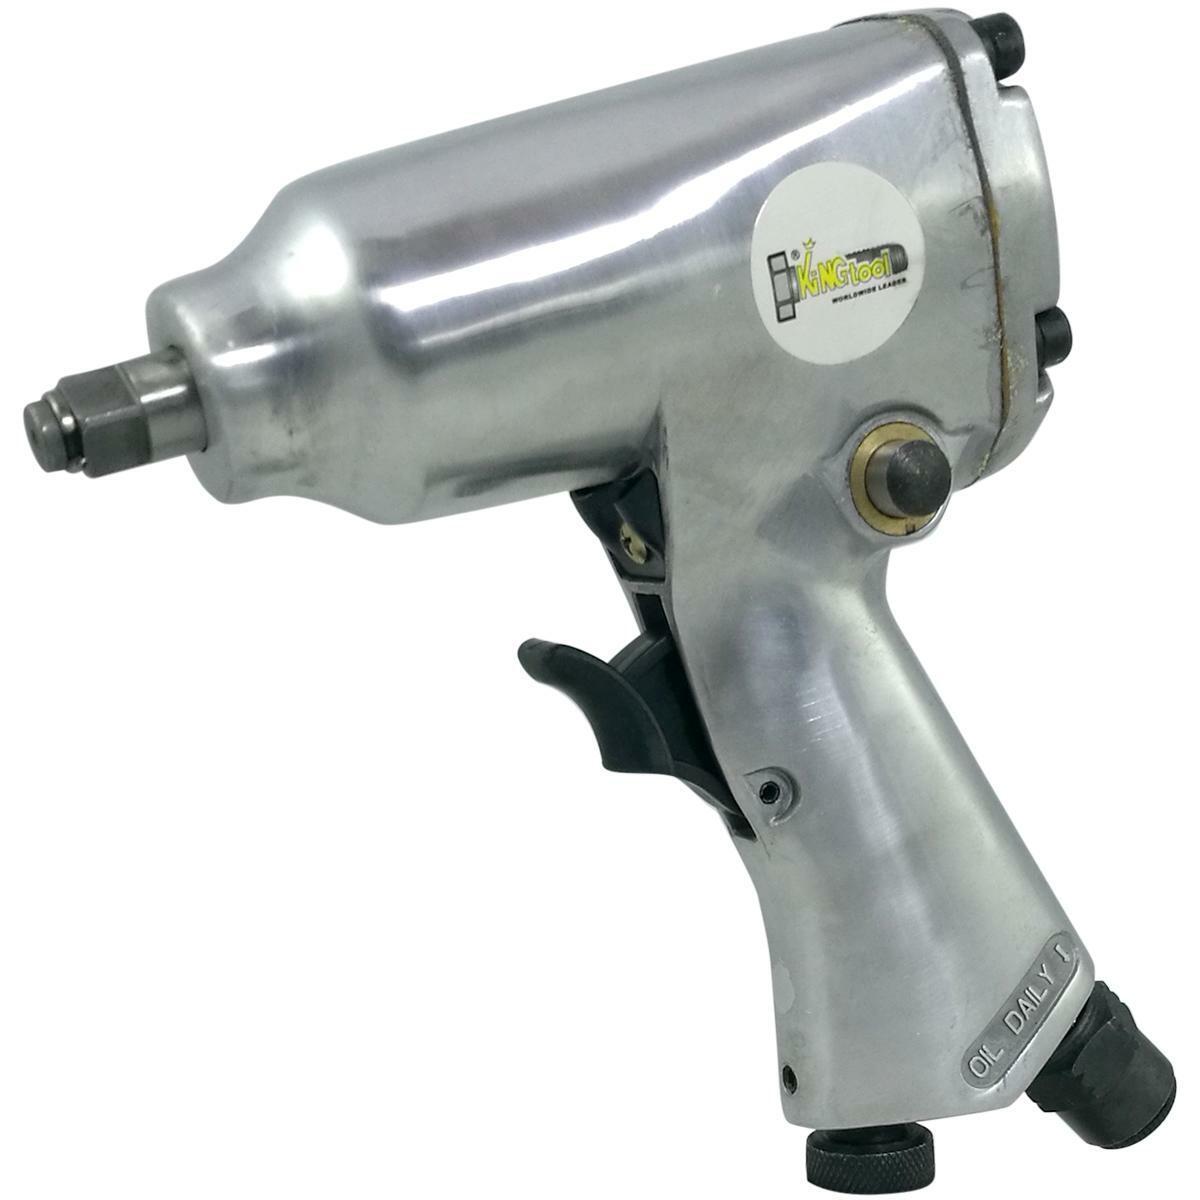 starkemunic avvitatore pneumatico 3/8 con adattatore 1/2